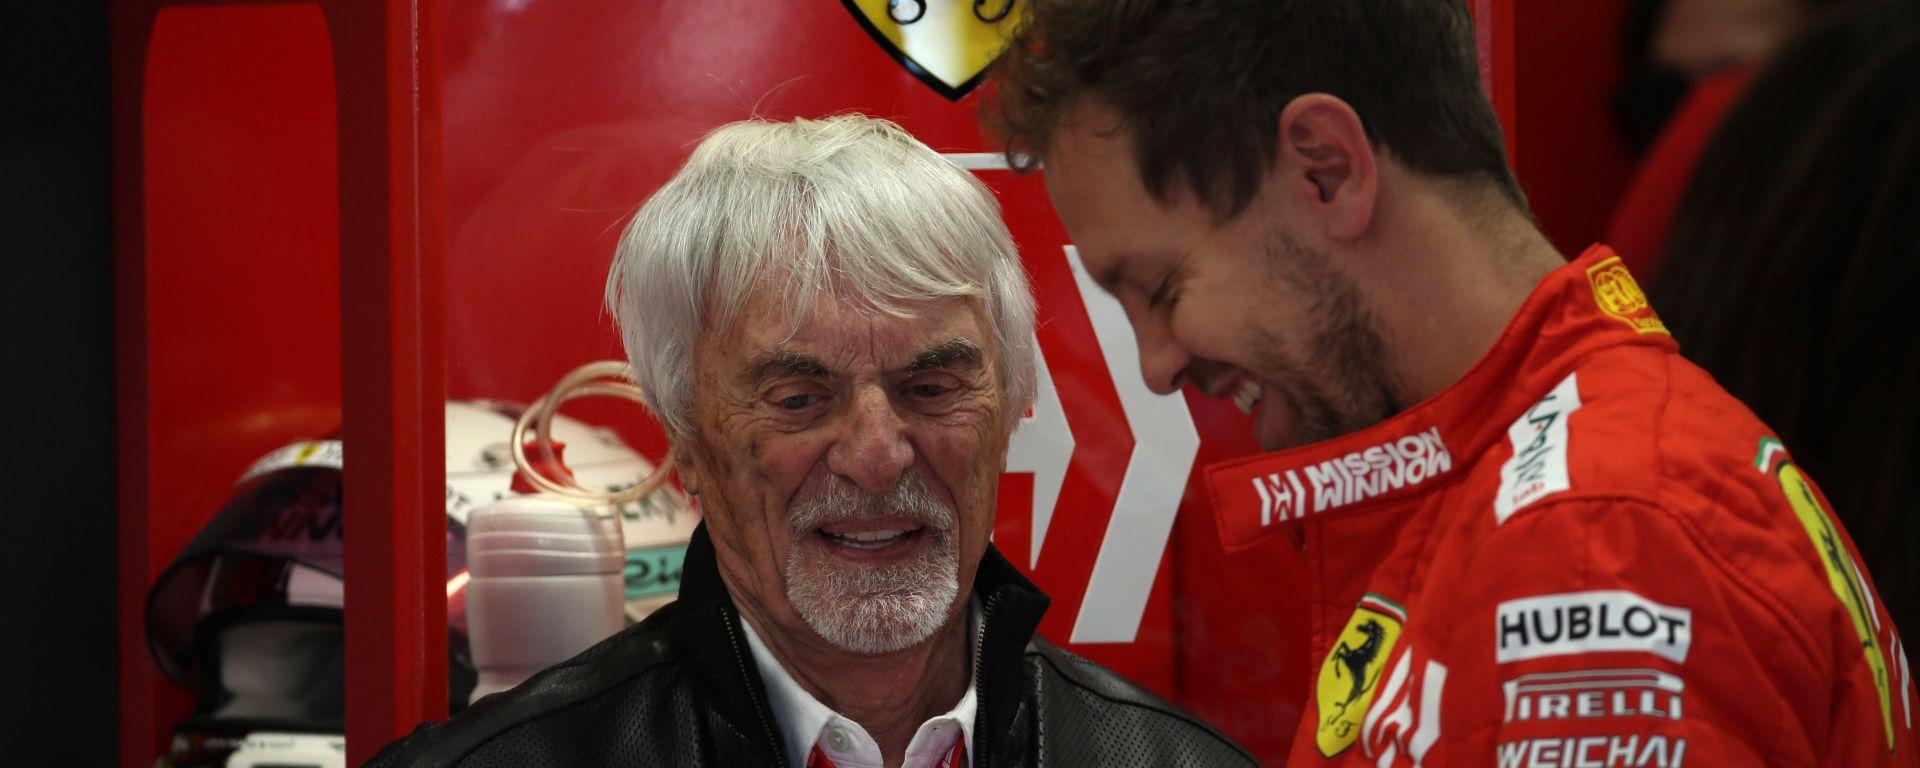 F1, GP Brasile 2019: Bernie Ecclestone nel box Ferrari con Sebastian Vettel